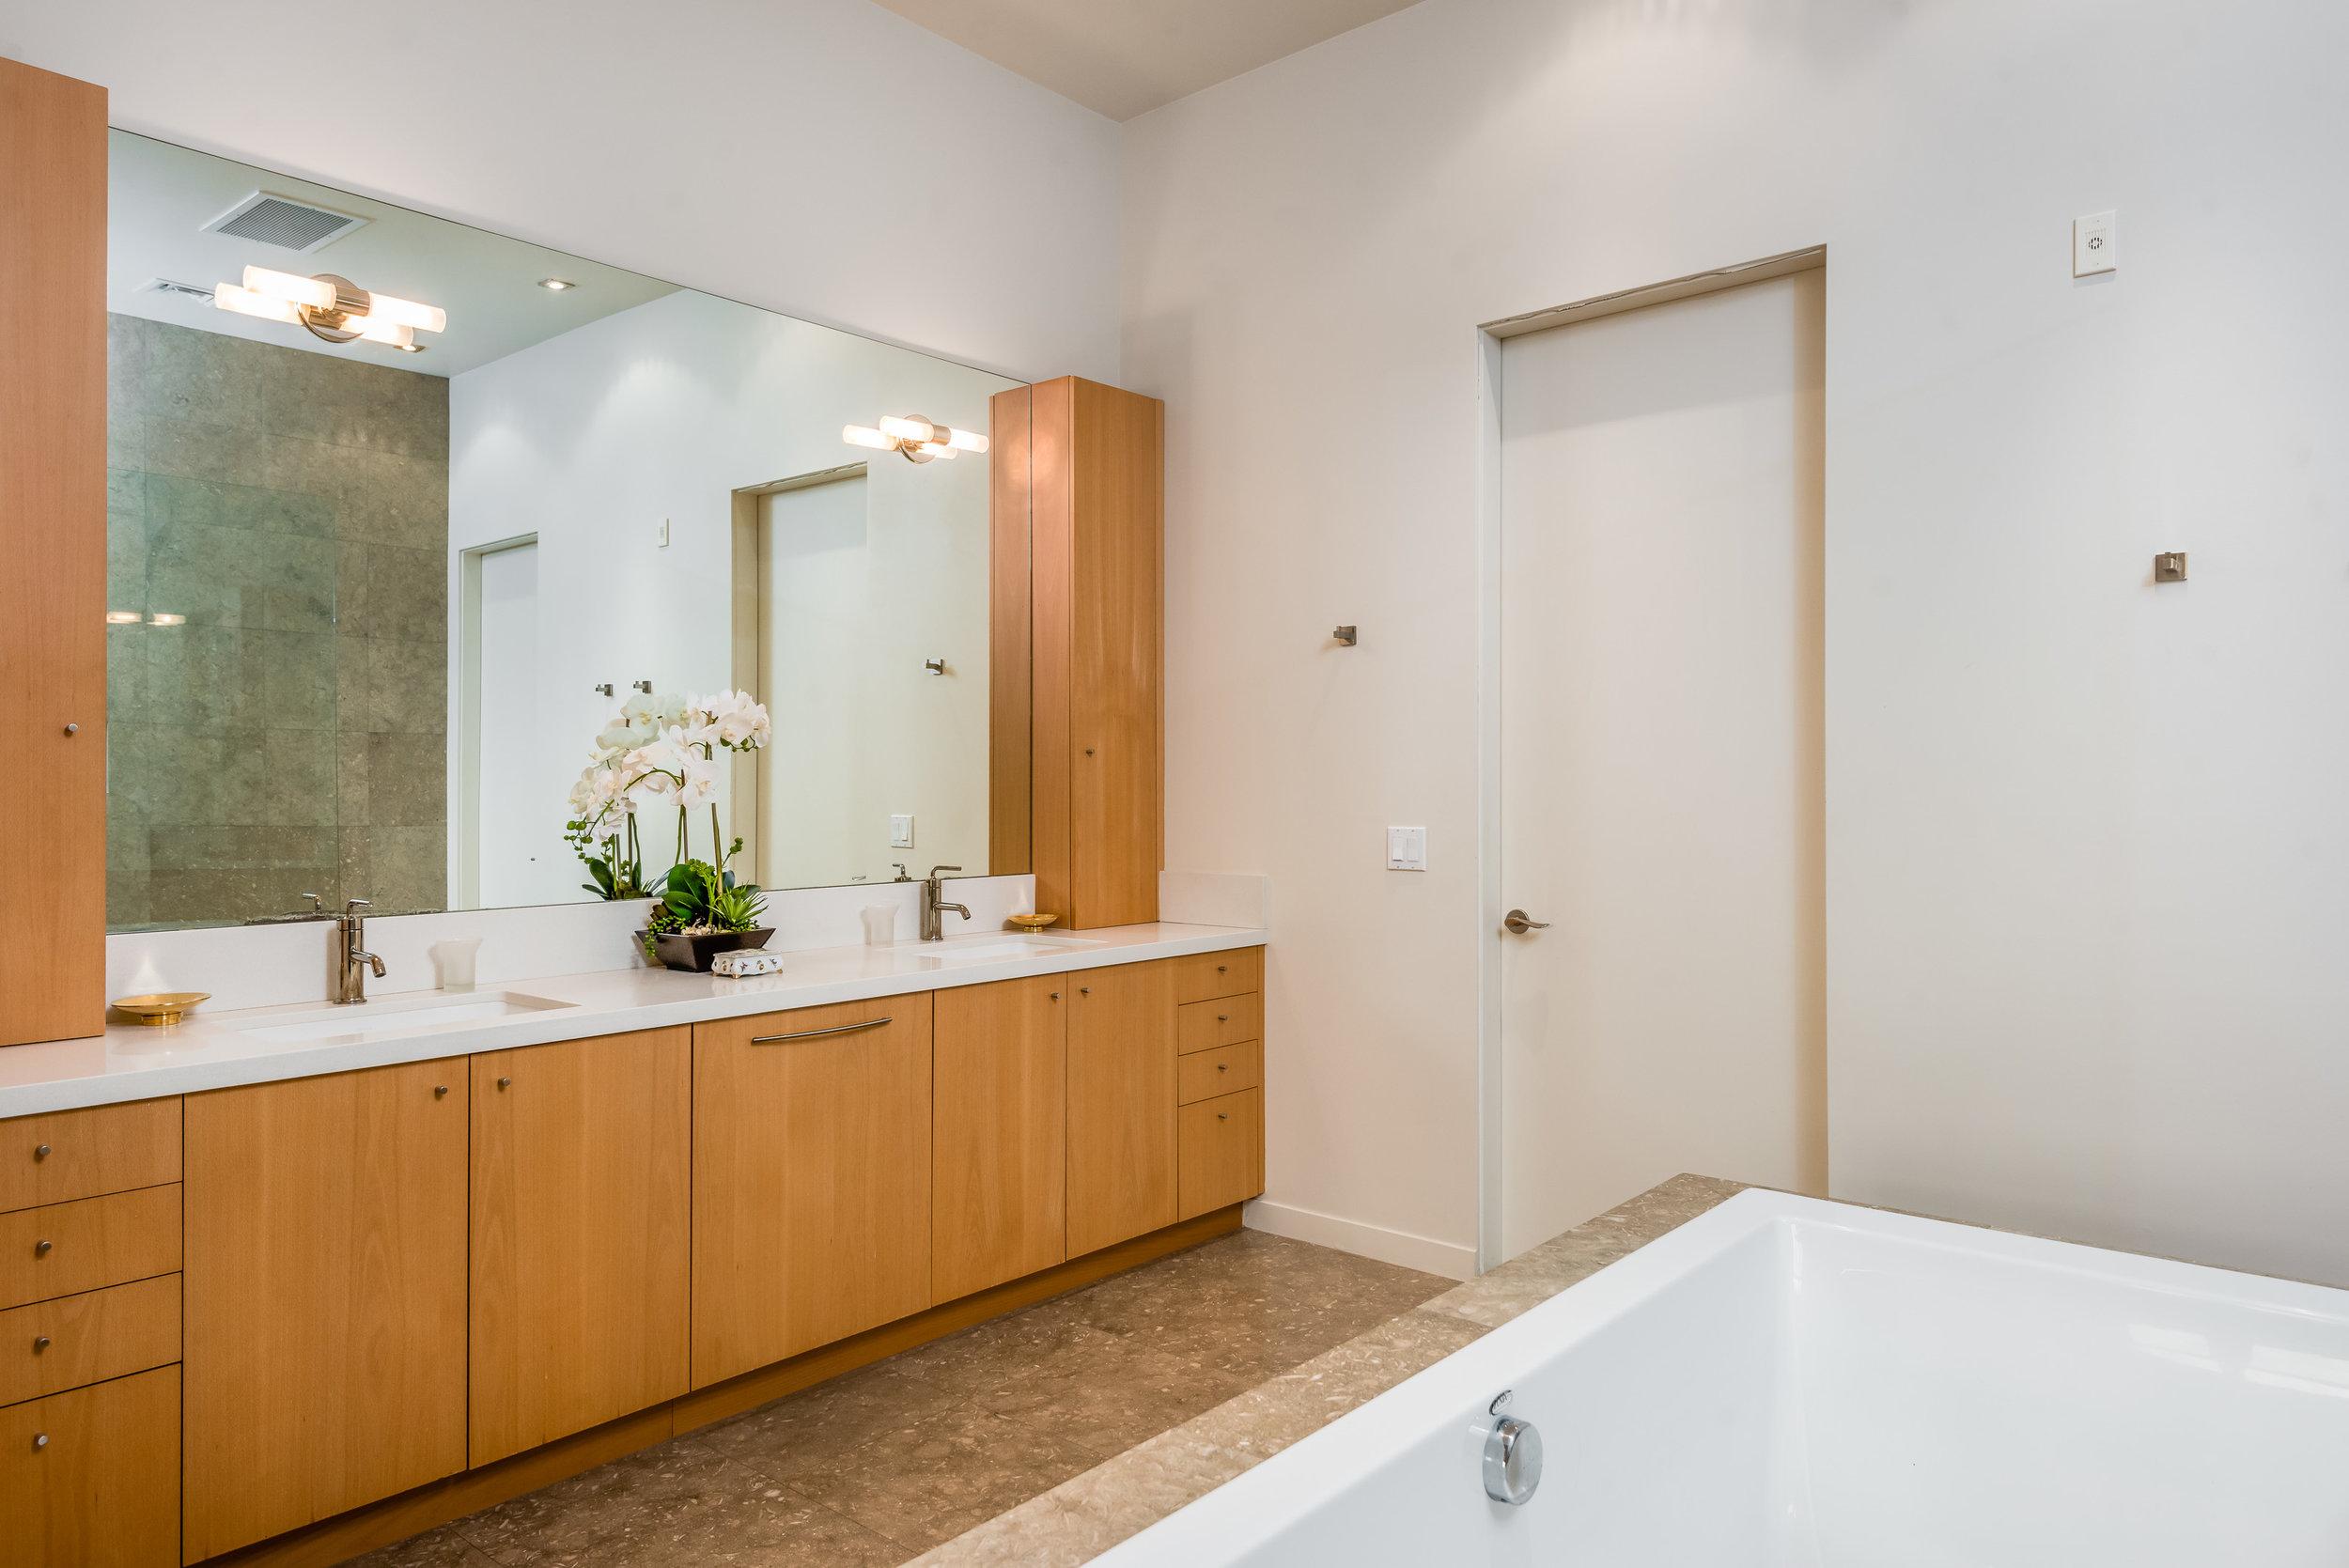 010_10-Master Bathroom.jpg